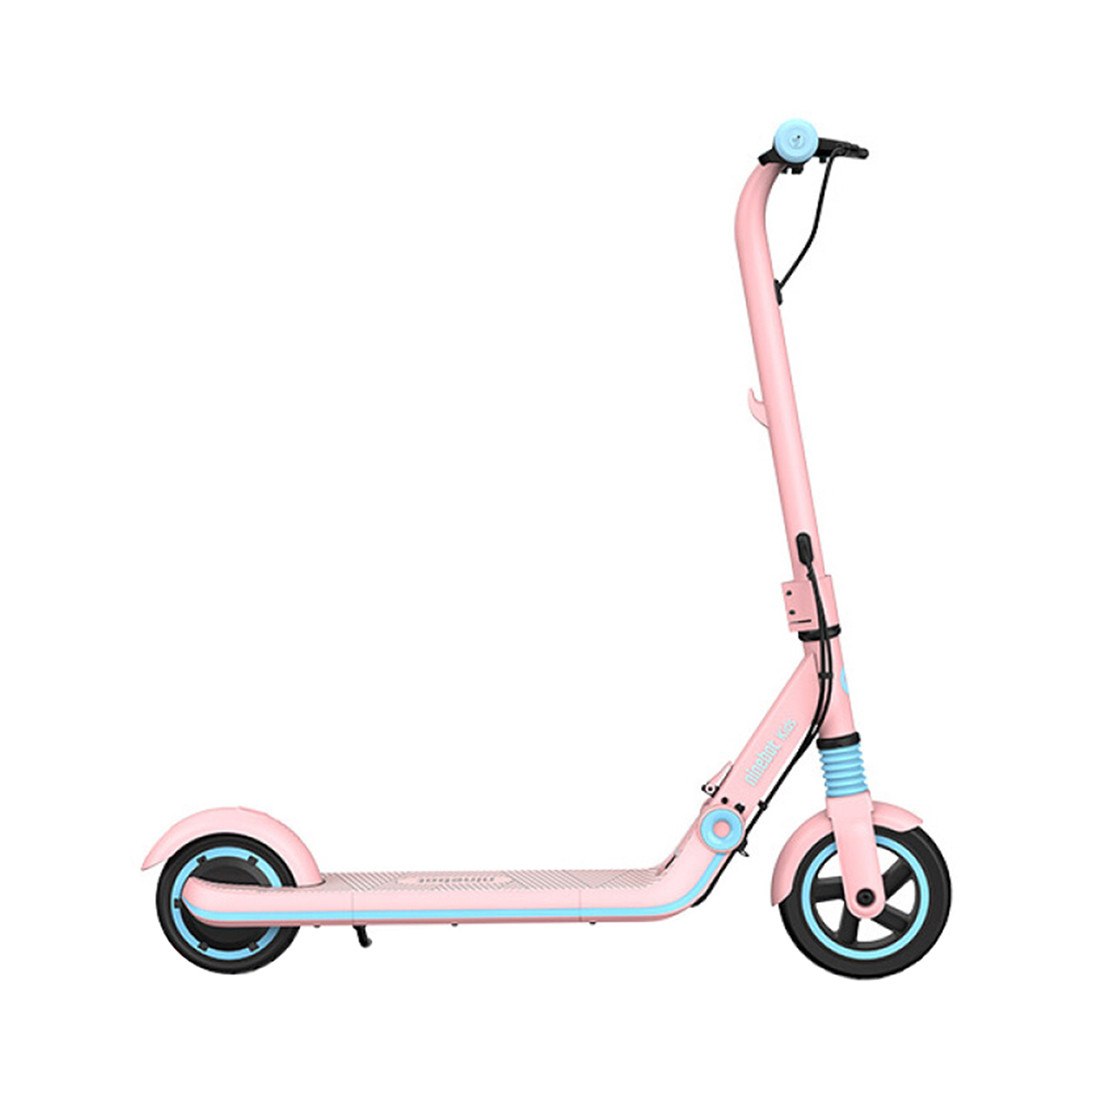 Электросамокат детский Ninebot KickScooter E8 Розовый - фото 2